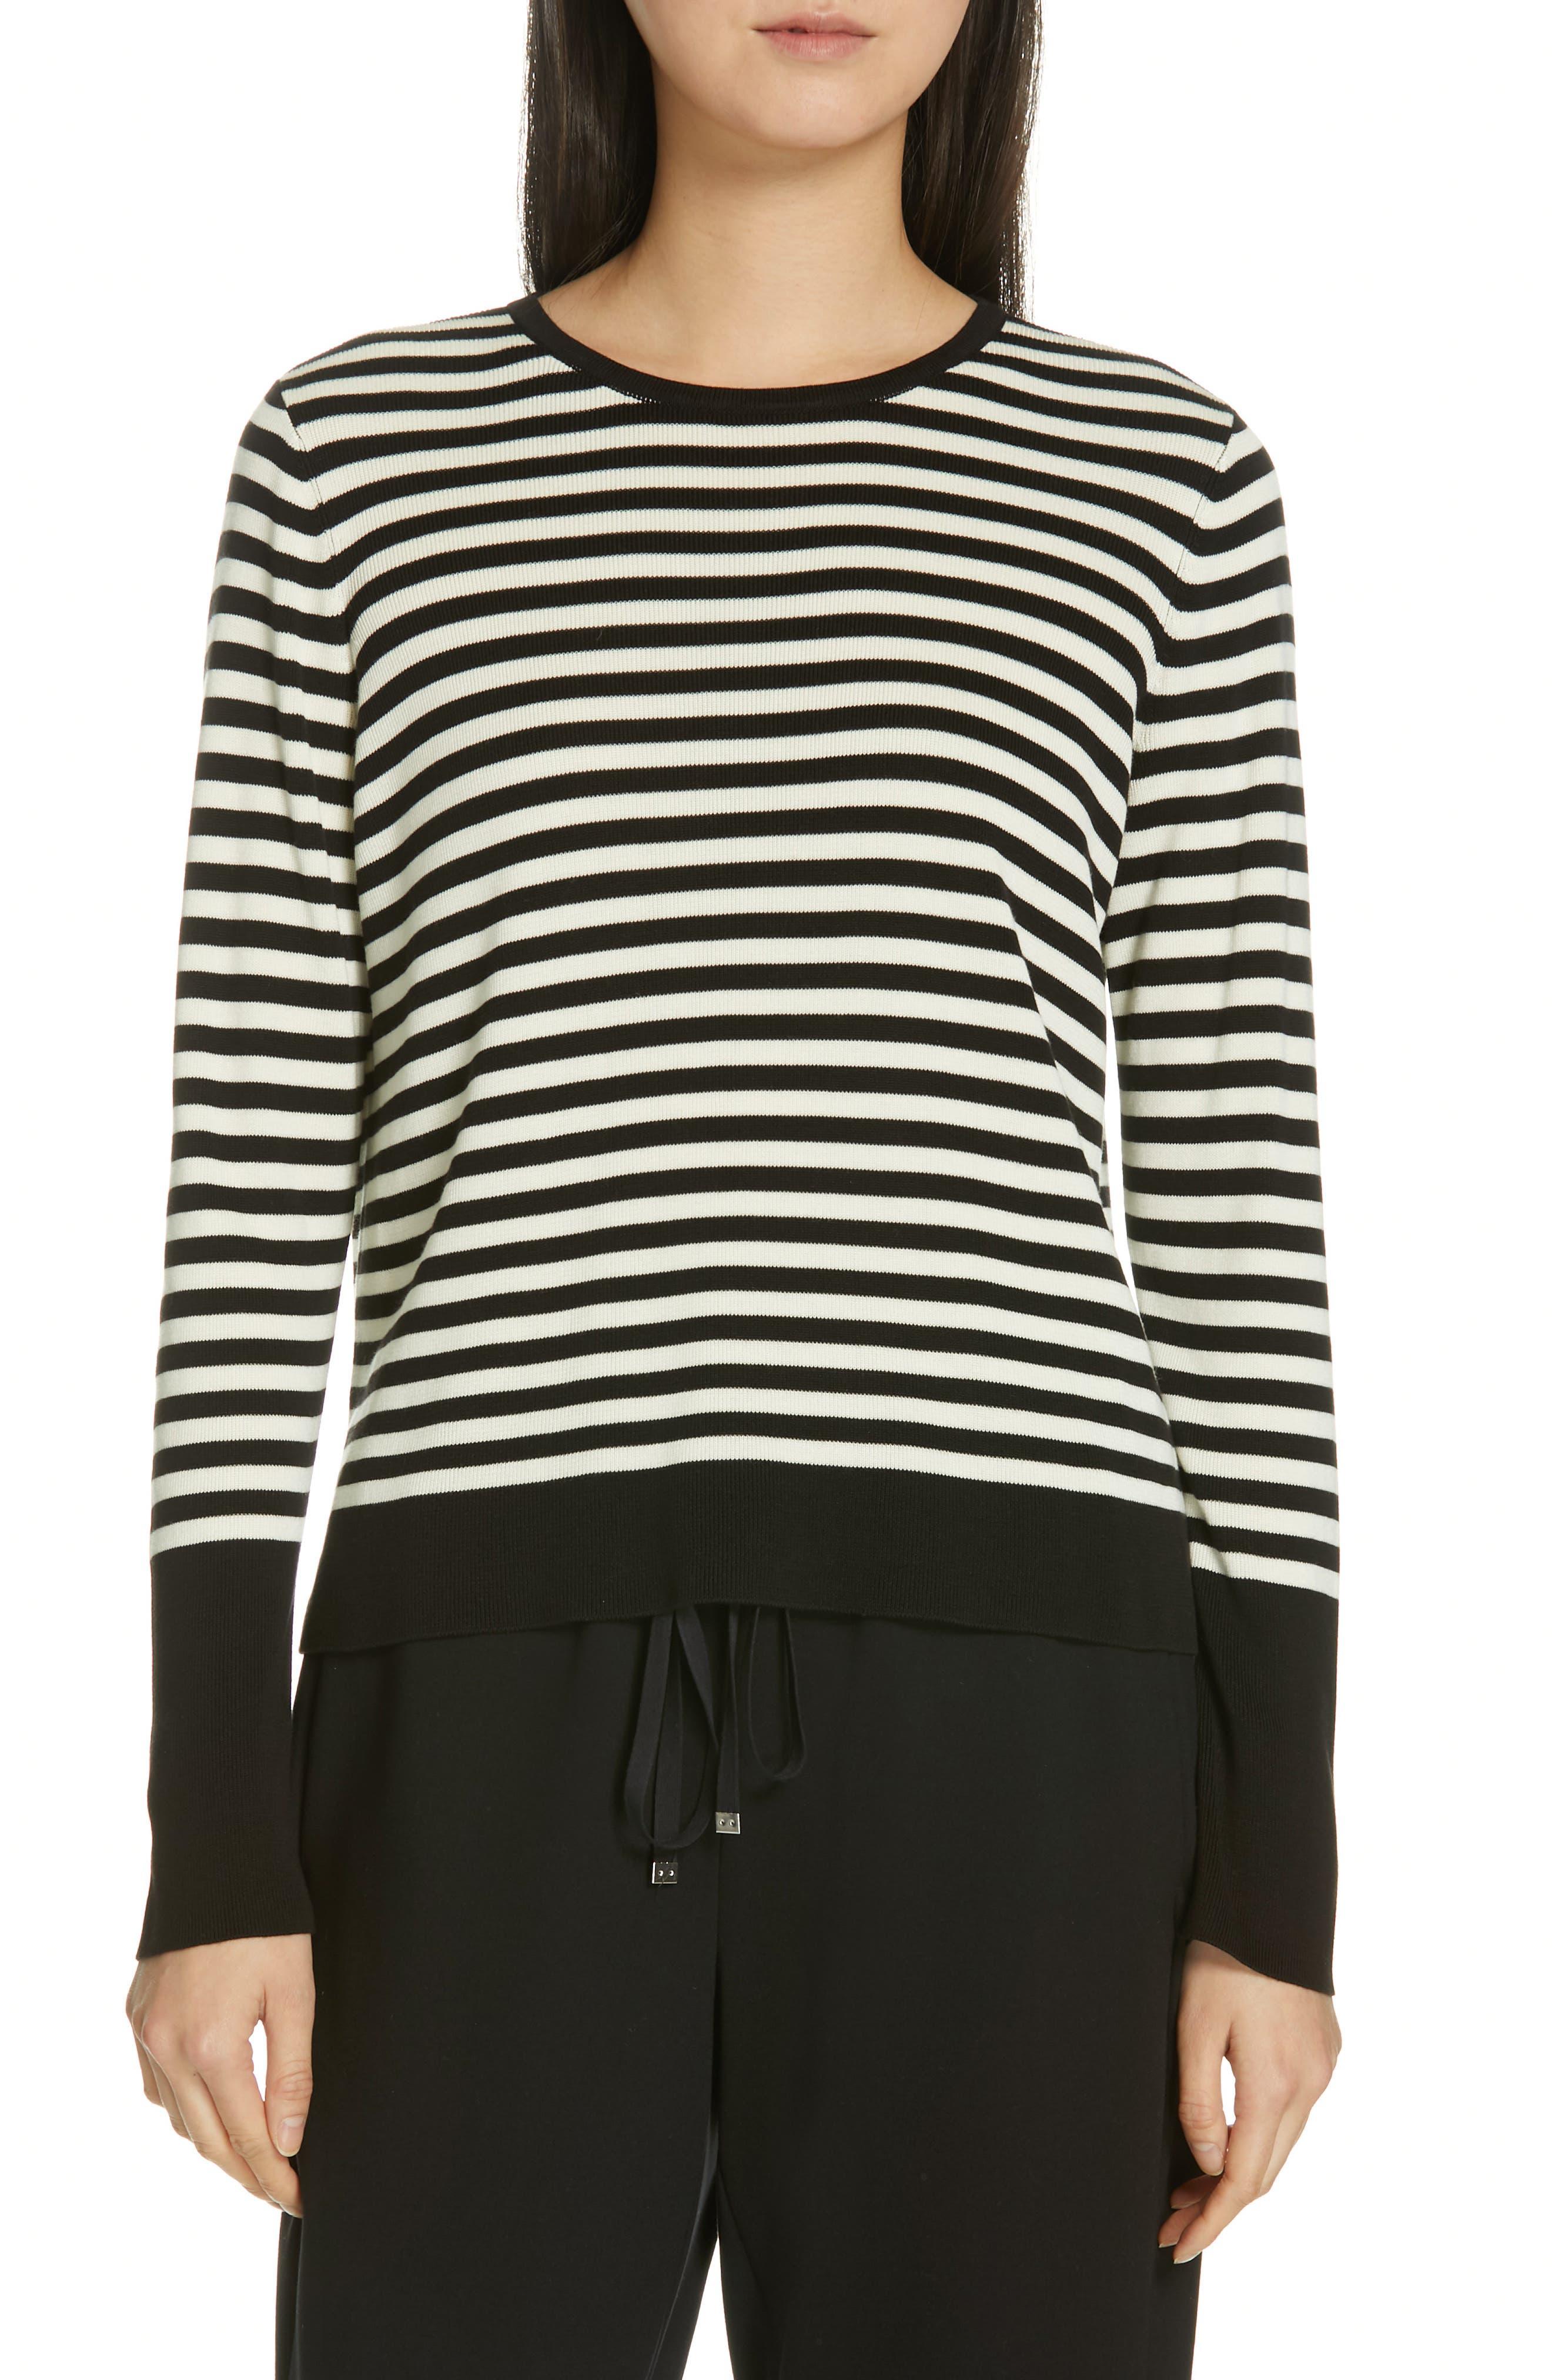 Tencel<sup>®</sup> Lyocell & Silk Sweater,                             Main thumbnail 1, color,                             BLACK/ SOFT WHITE